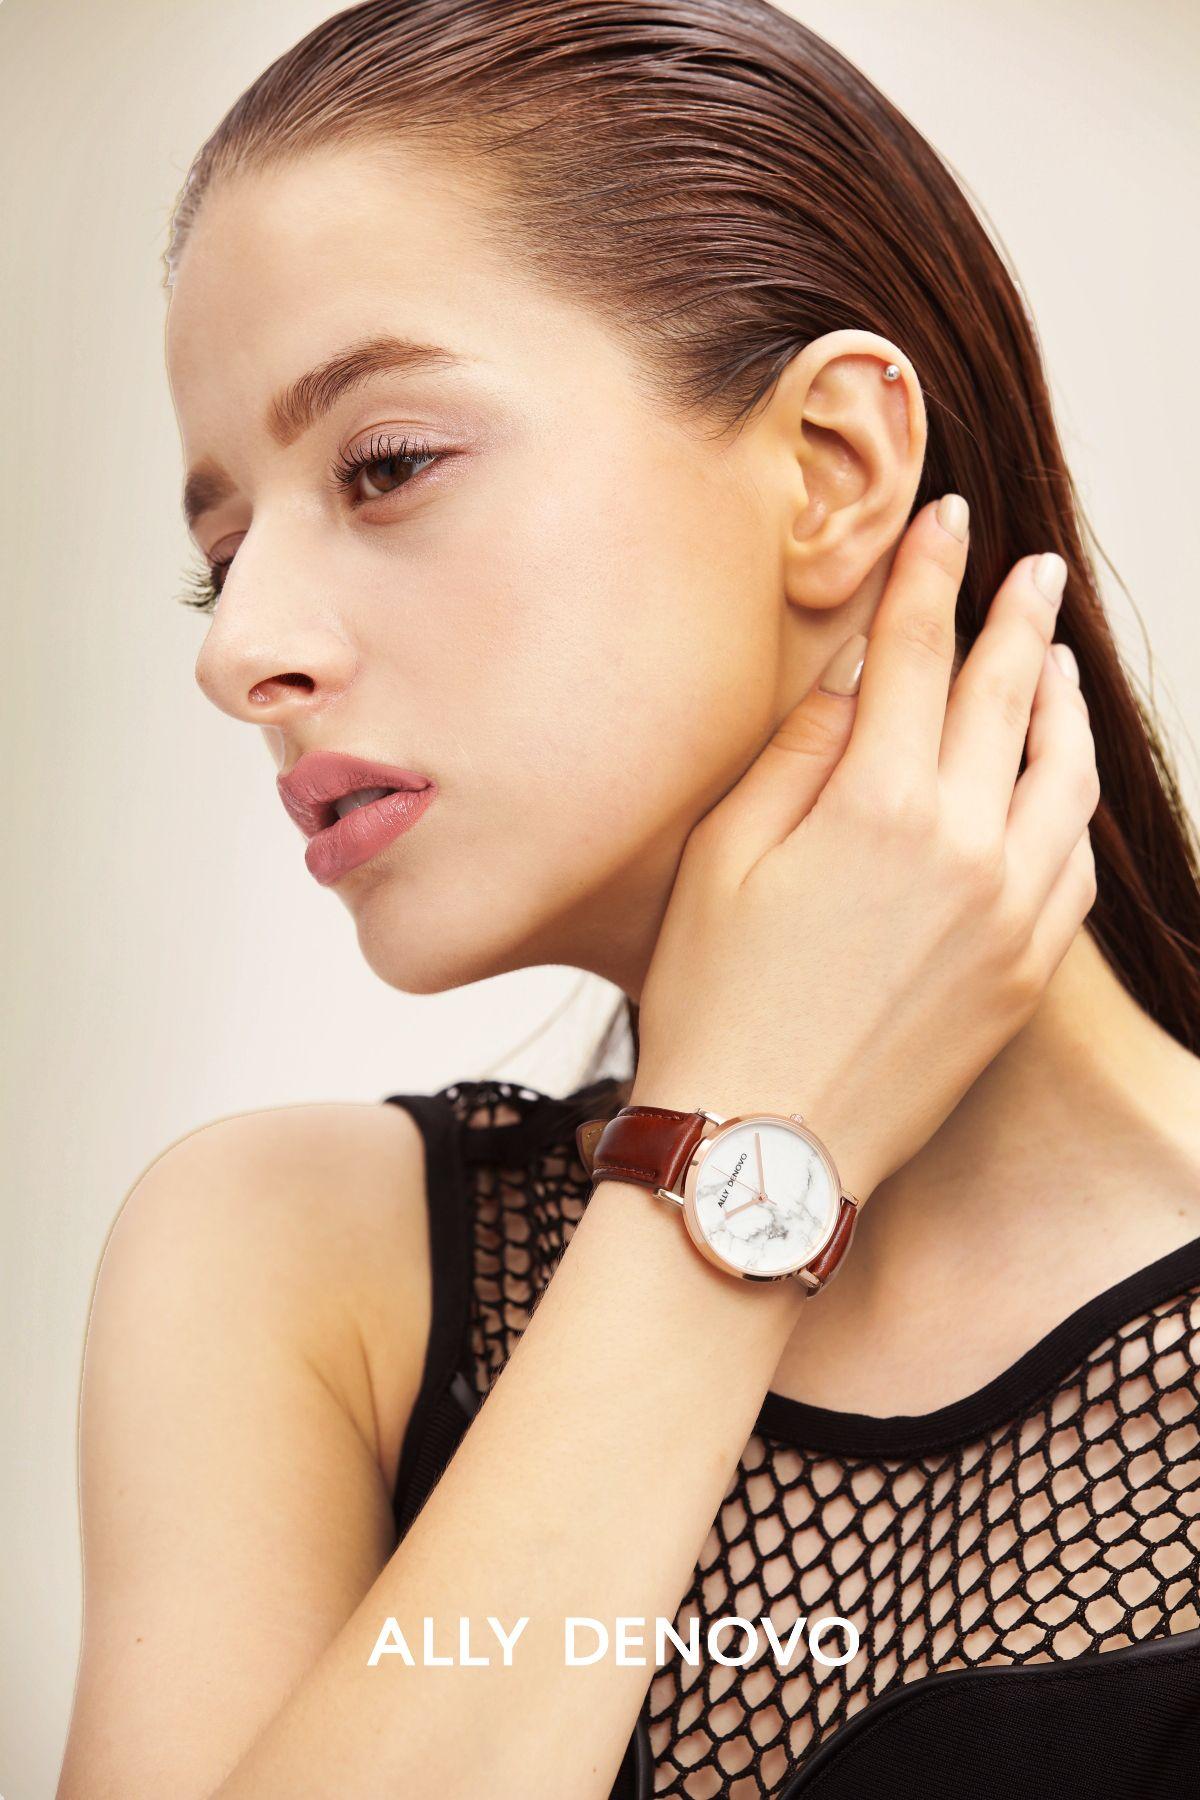 "<p>品牌經典的菱形琉璃錶款,由珍珠母貝手工拼製而成,滿足你獨一無二的纖細美感,而以簡約設計風靡眾人的大理石錶款,則是從石材切割開始,都在義大利的大理石重鎮製作,其圖紋各異的天然石材也提供另類的視覺感受。<span class=""redactor-invisible-space""></span></p>"